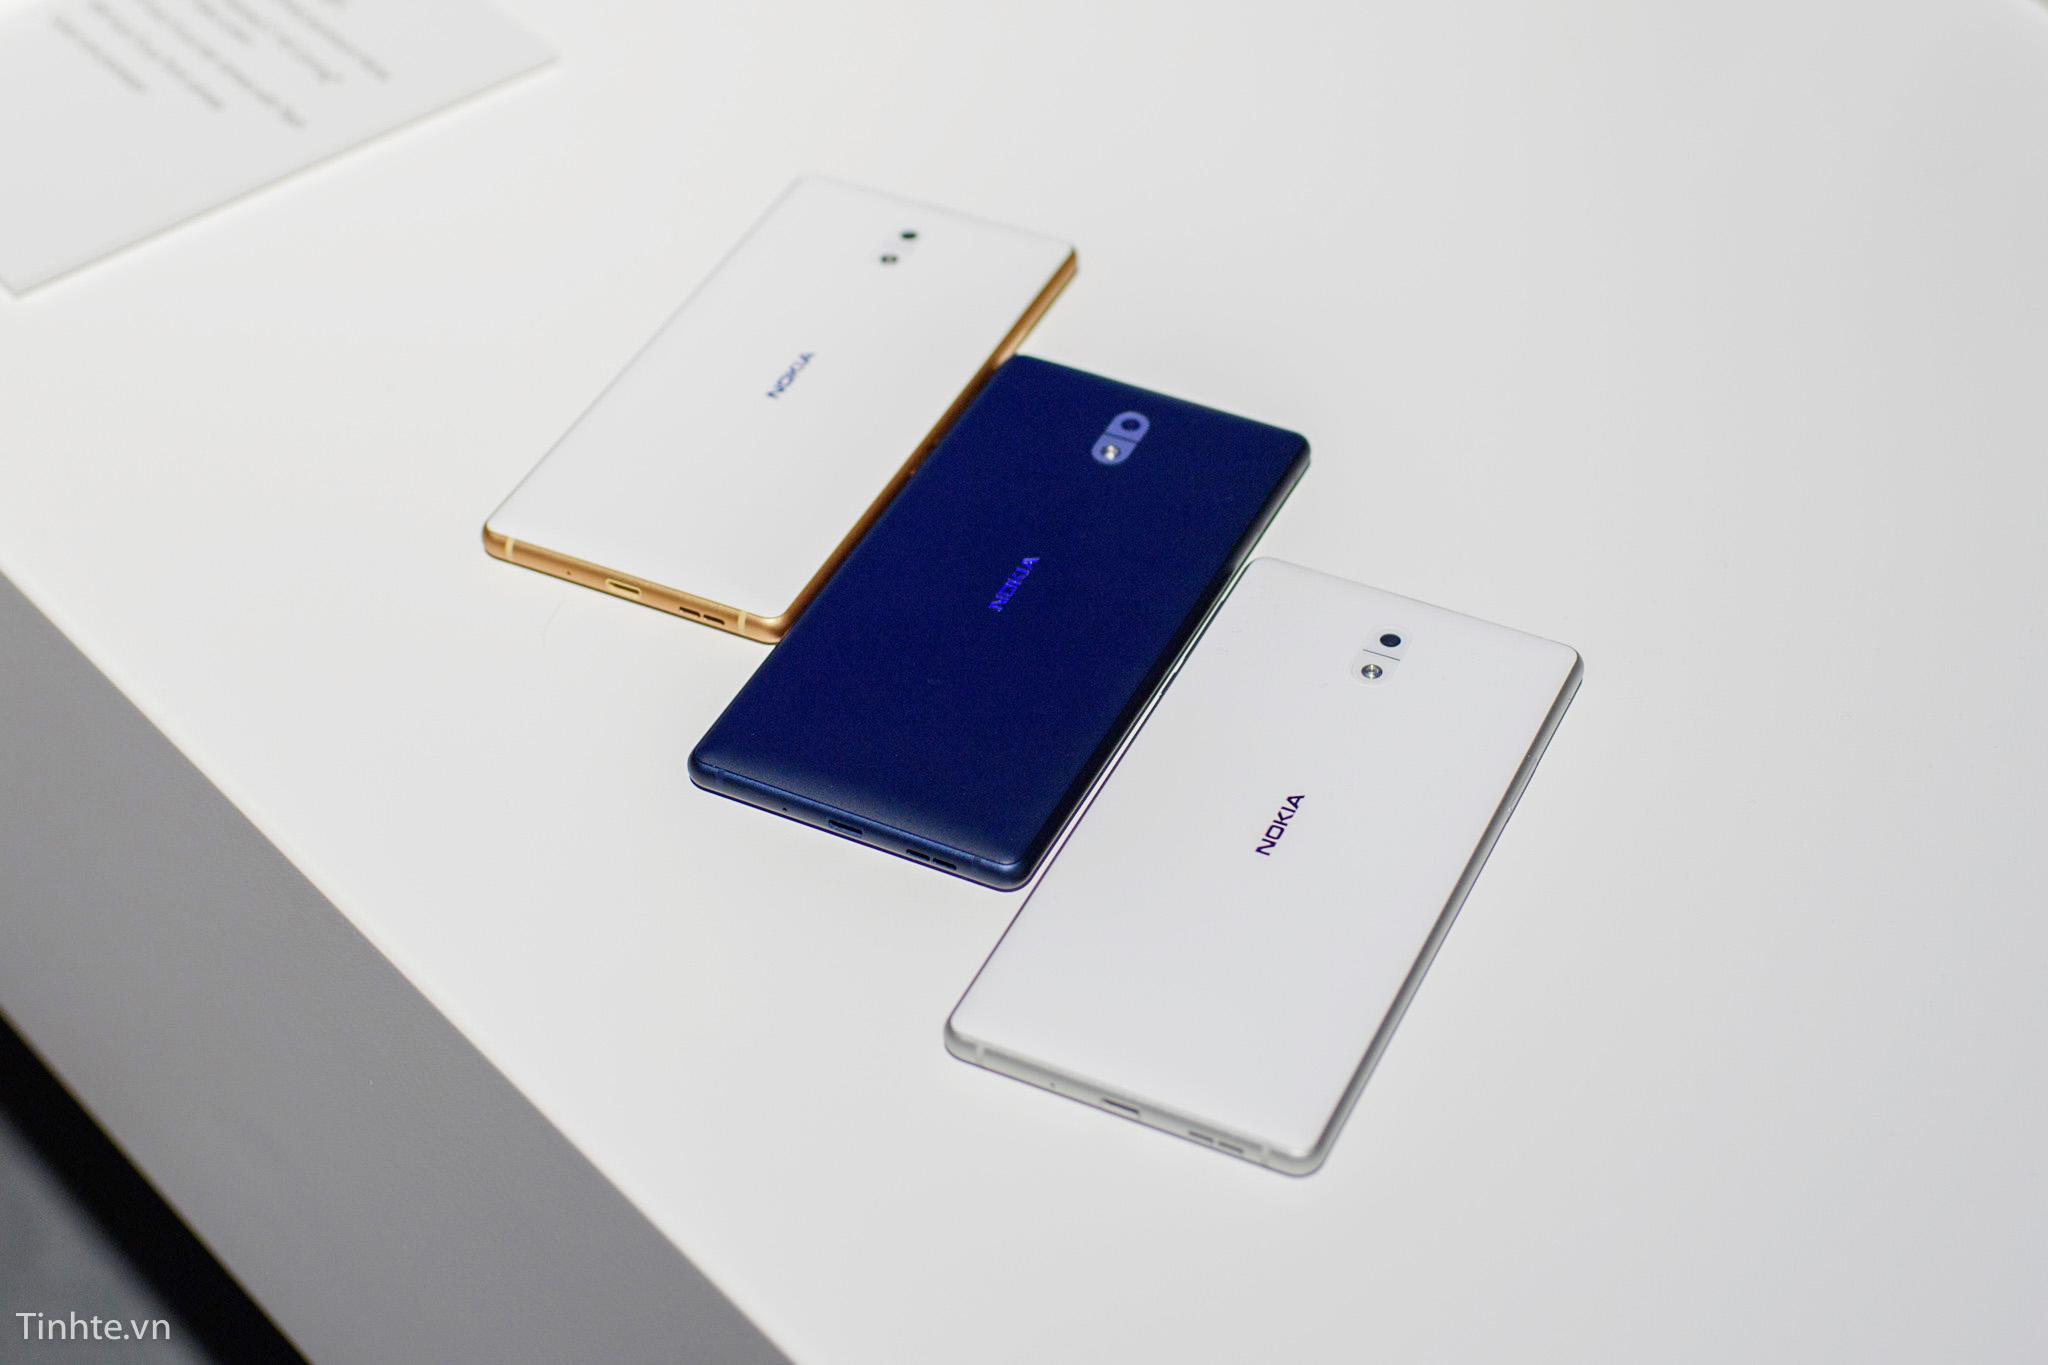 Nokia_3_5_quay_tro_lai_3.jpg